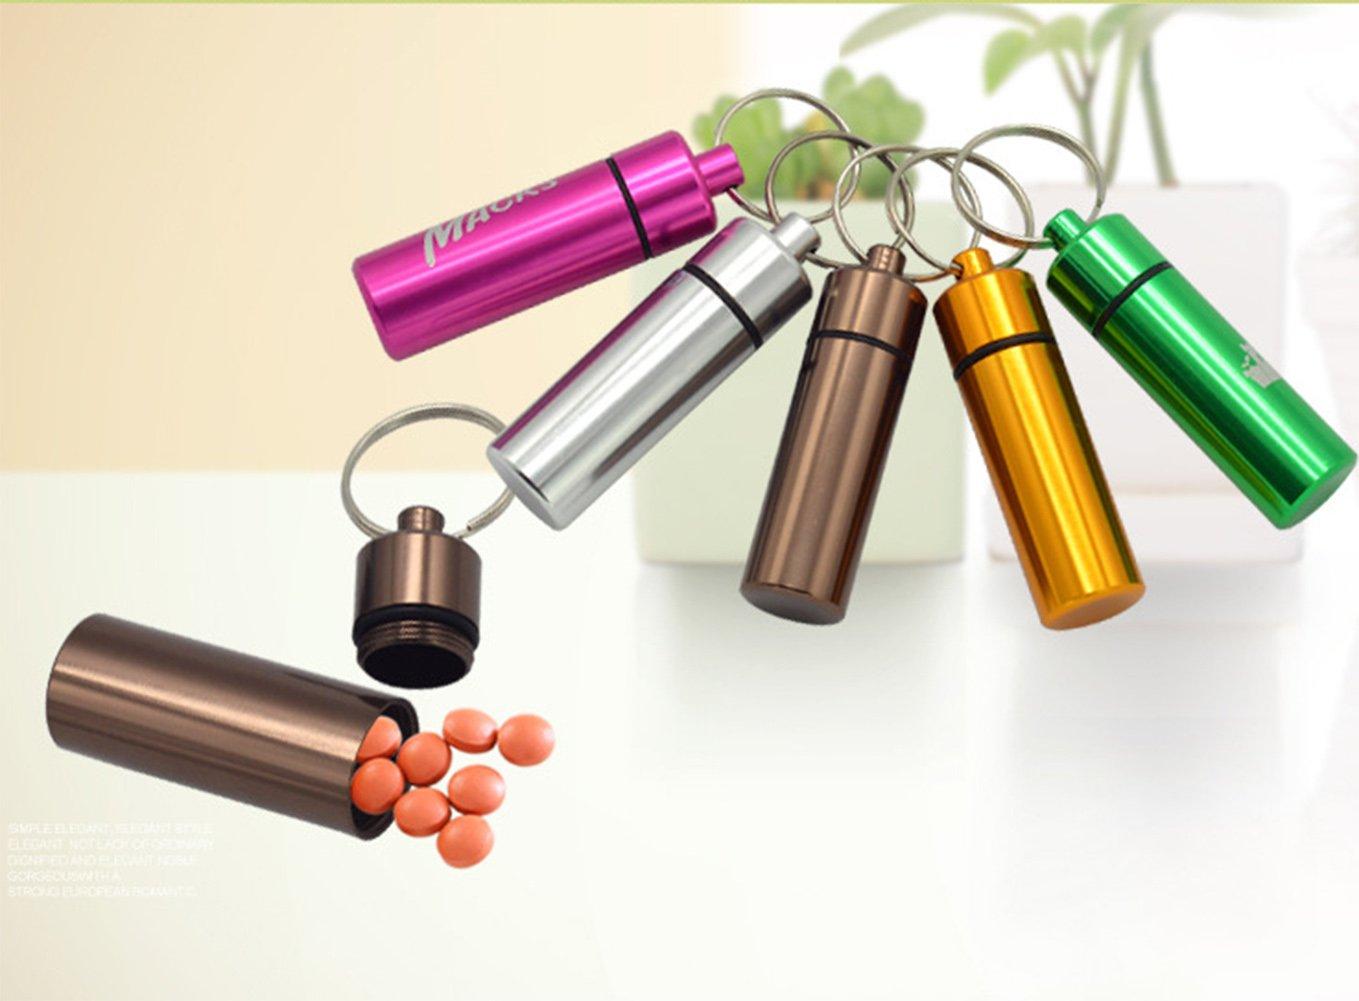 Yunko 6 Pcs Waterproof Aluminum Pill Bottle Organizer Box Case Drug Holder Keychain Container Travel Medicine Storage Color Random by YunKo (Image #6)